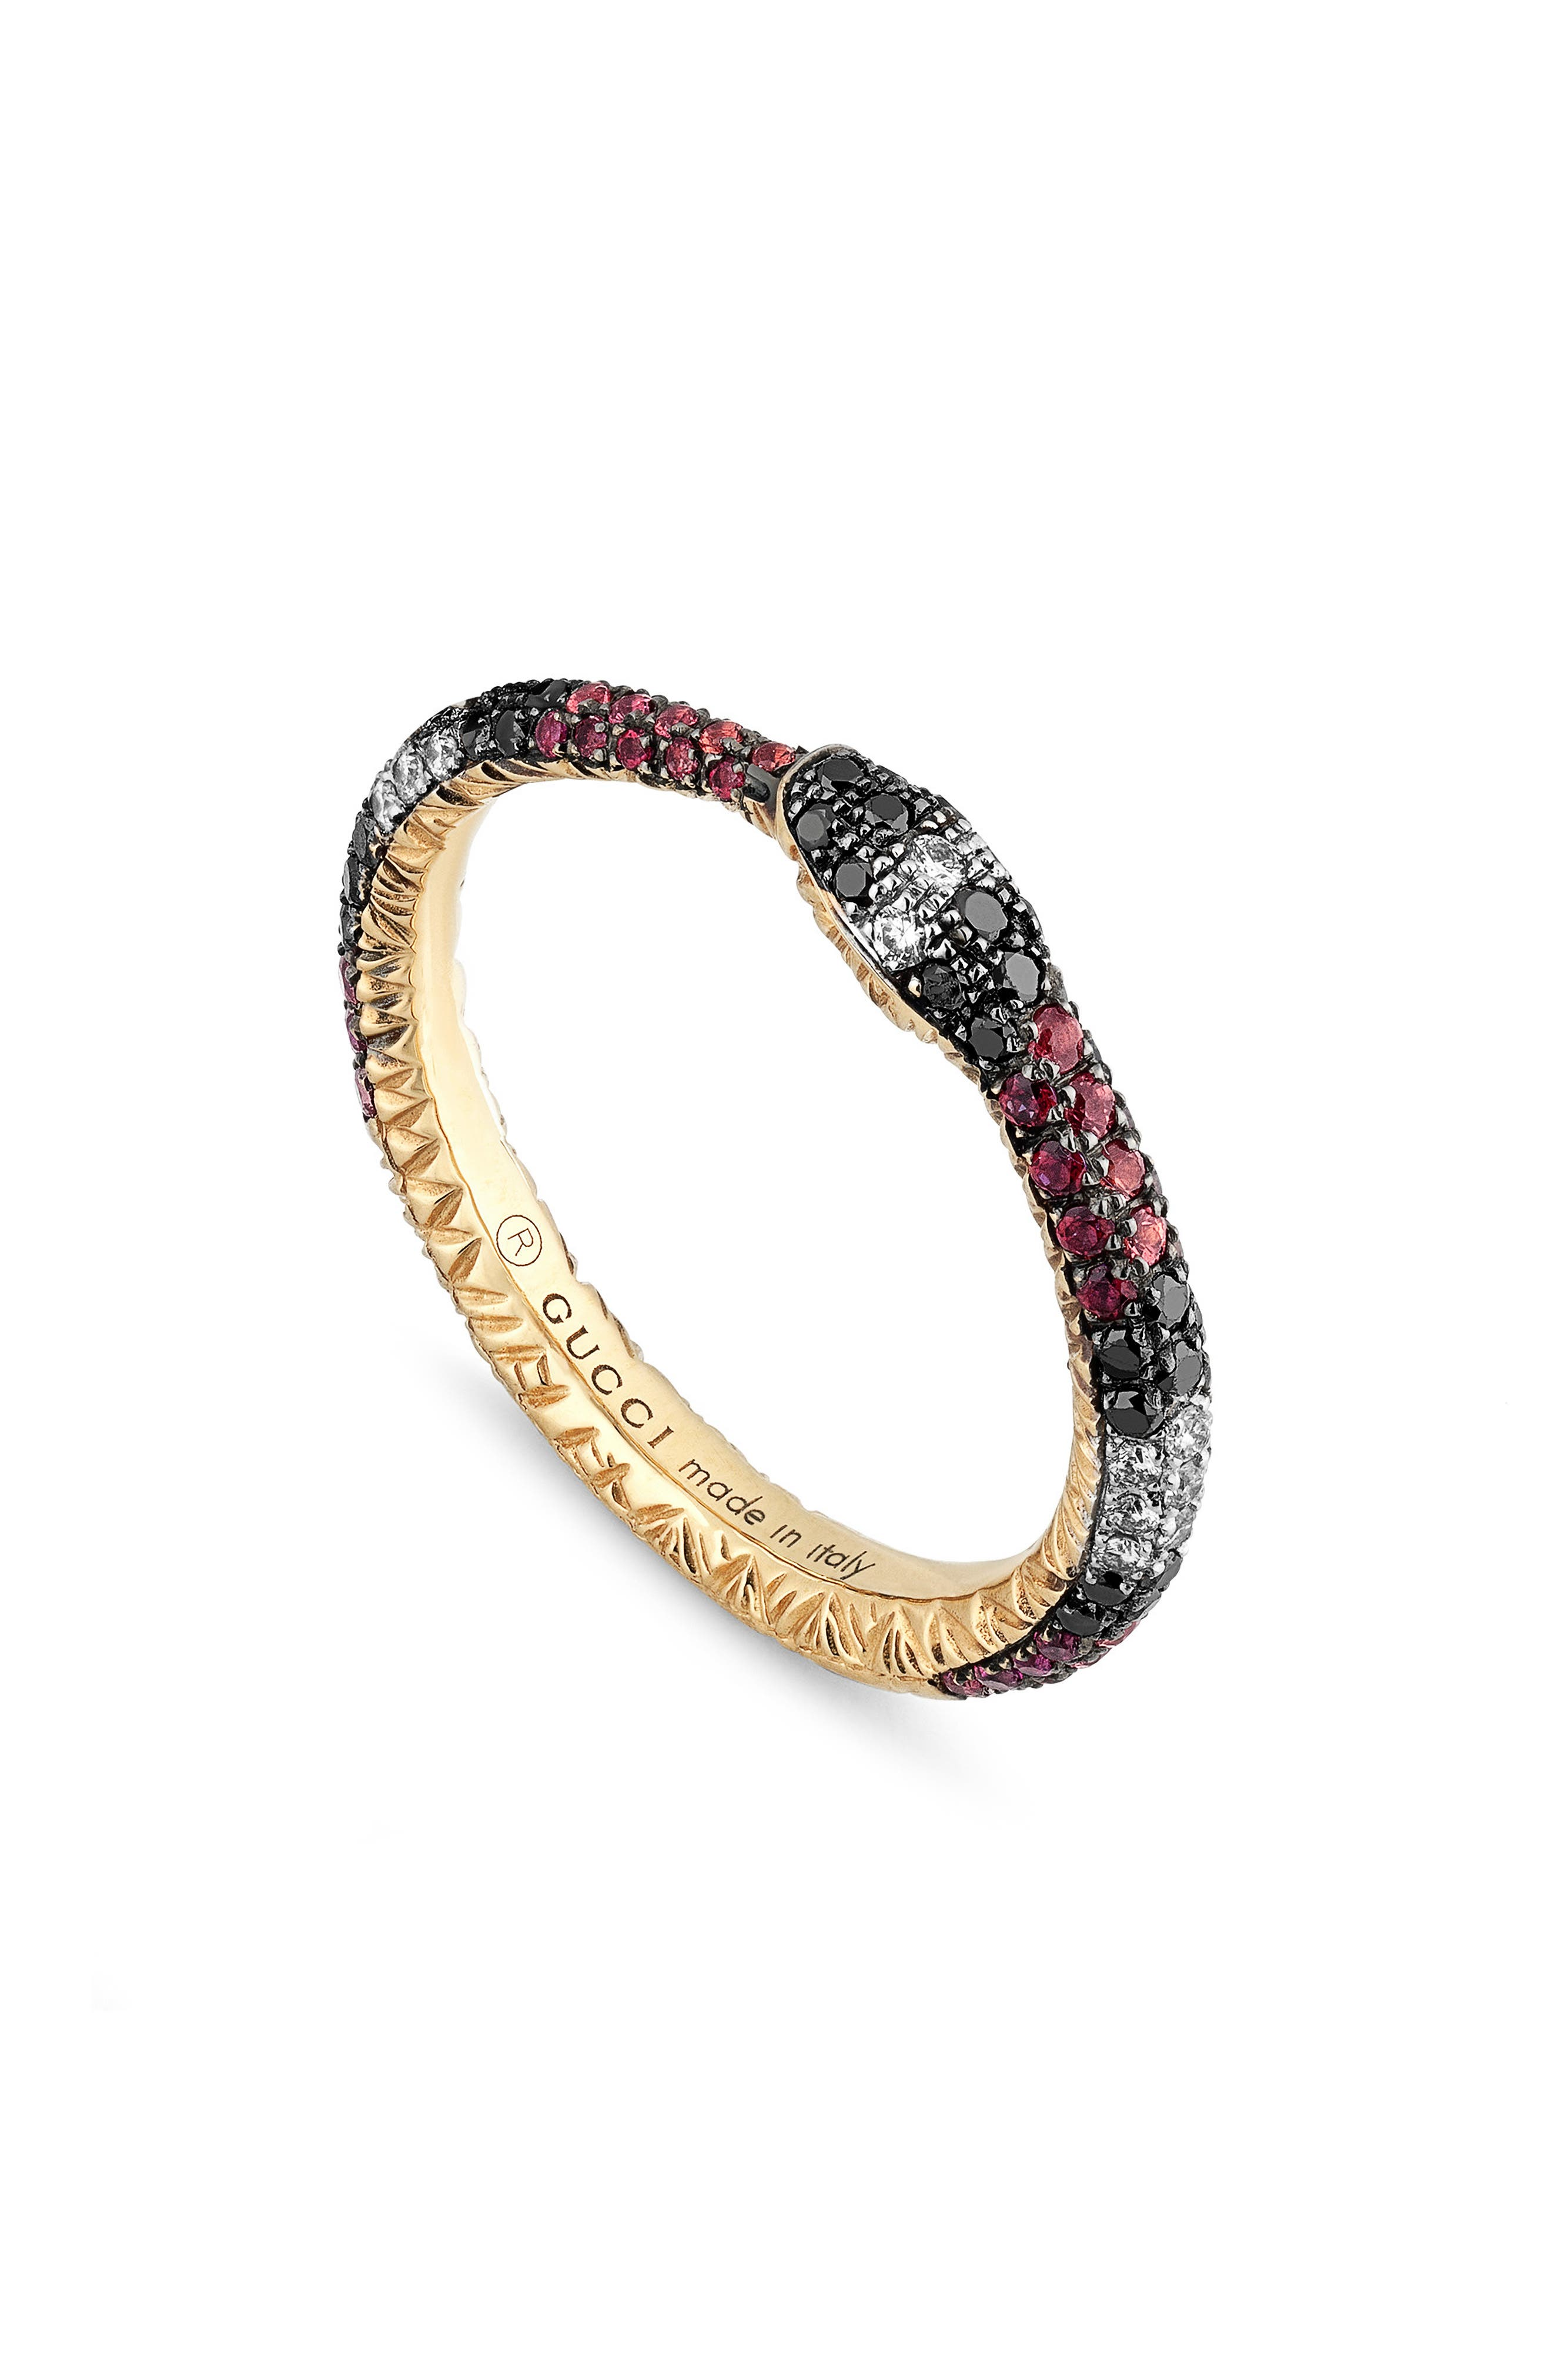 GUCCI Ouroboros Diamond & Stone Pavé Snake Ring, Main, color, TOPAZ/ SAPPHIRE/ BLACK DIAMOND